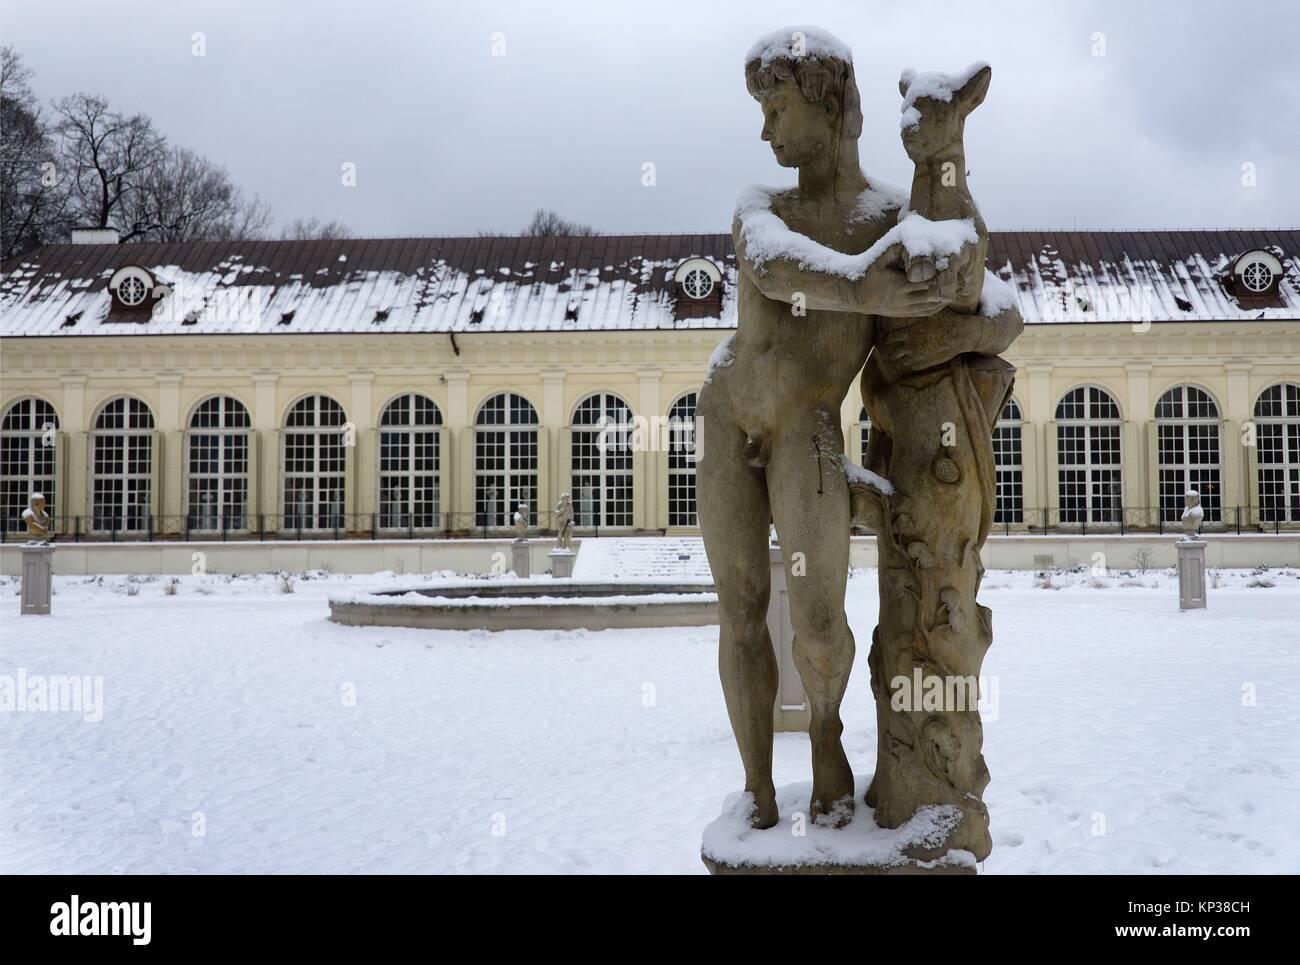 Statues In Front Of Stara Pomaranczarnia Building In Winter